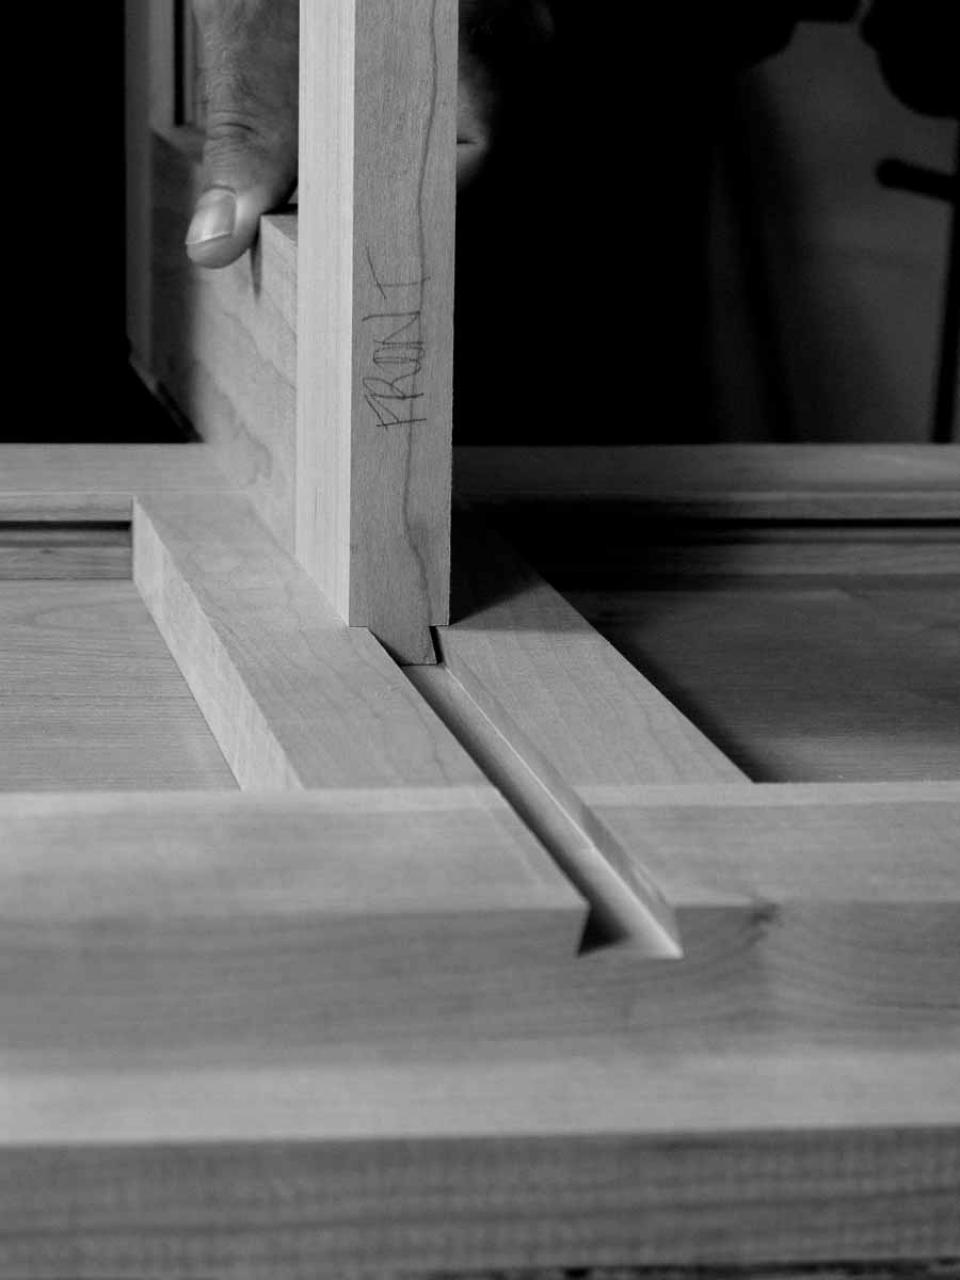 assembling a sliding dovetail joint 2